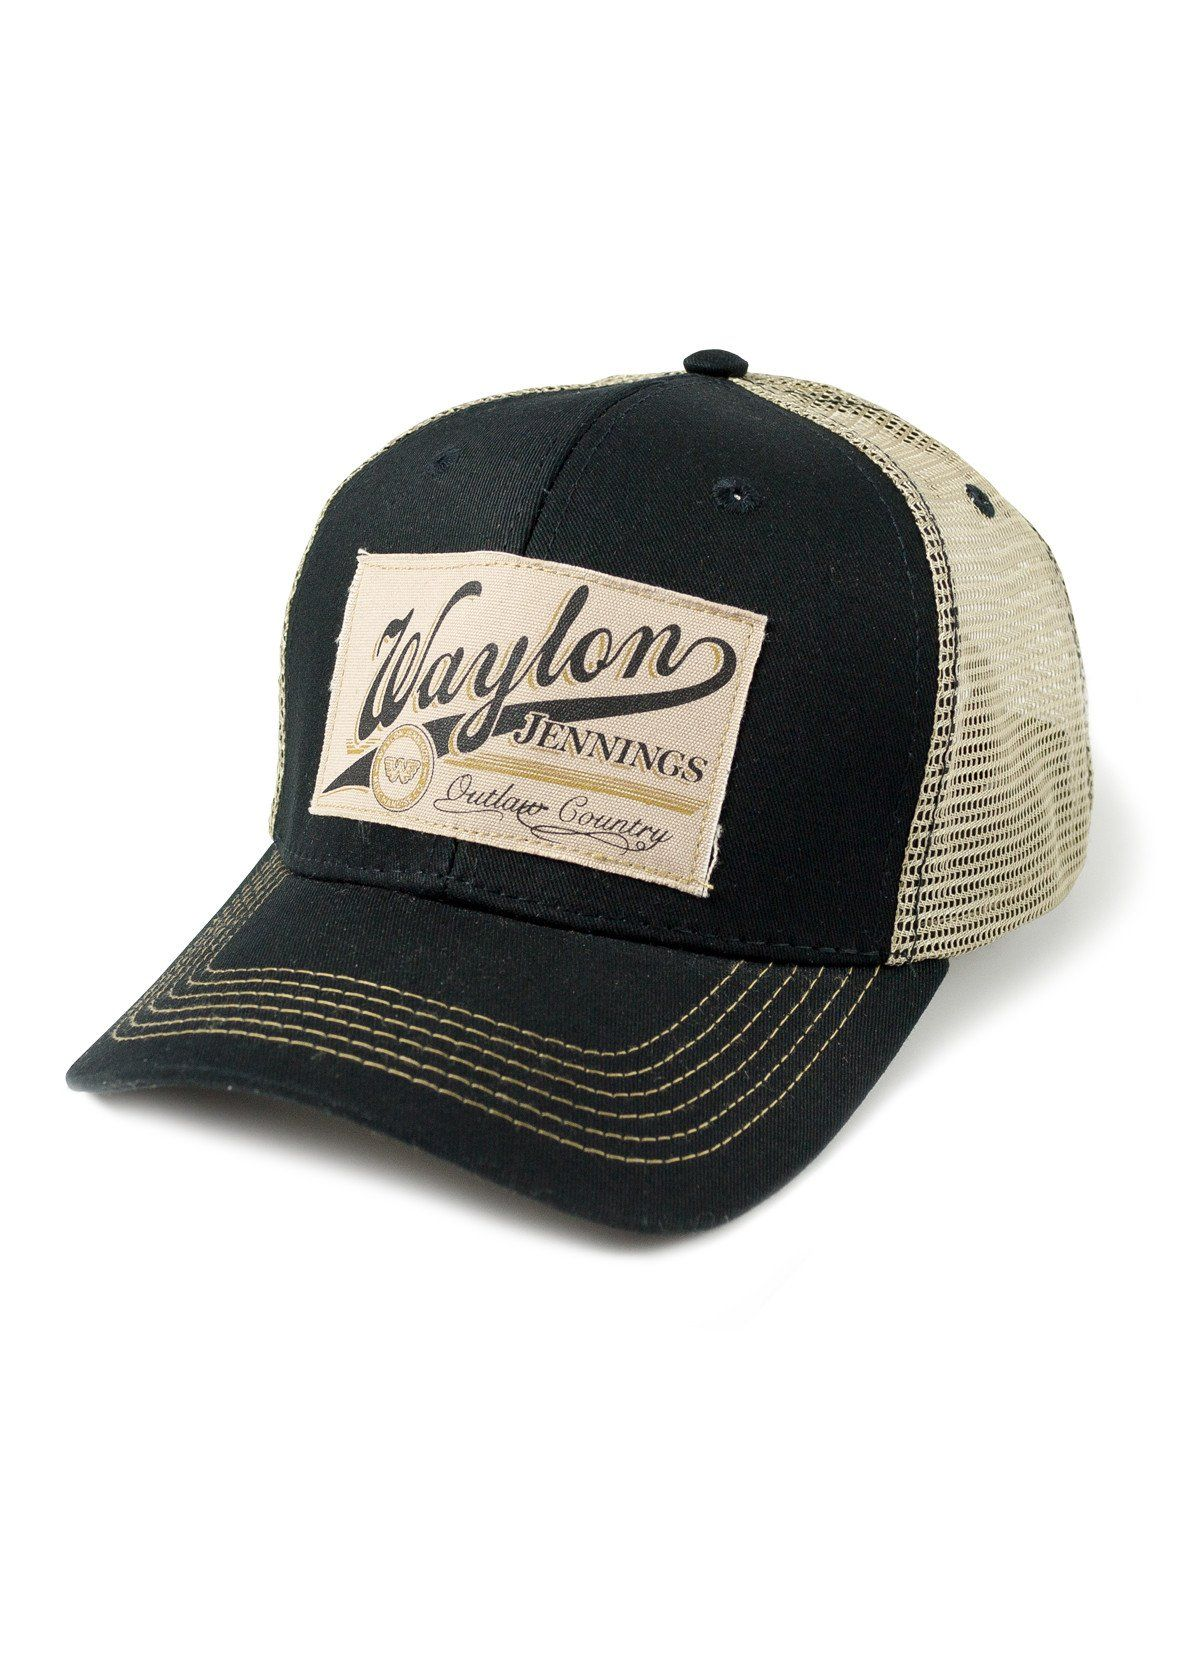 54342c6e6f37e Waylon Jennings Outlaw Country Trucker Hat